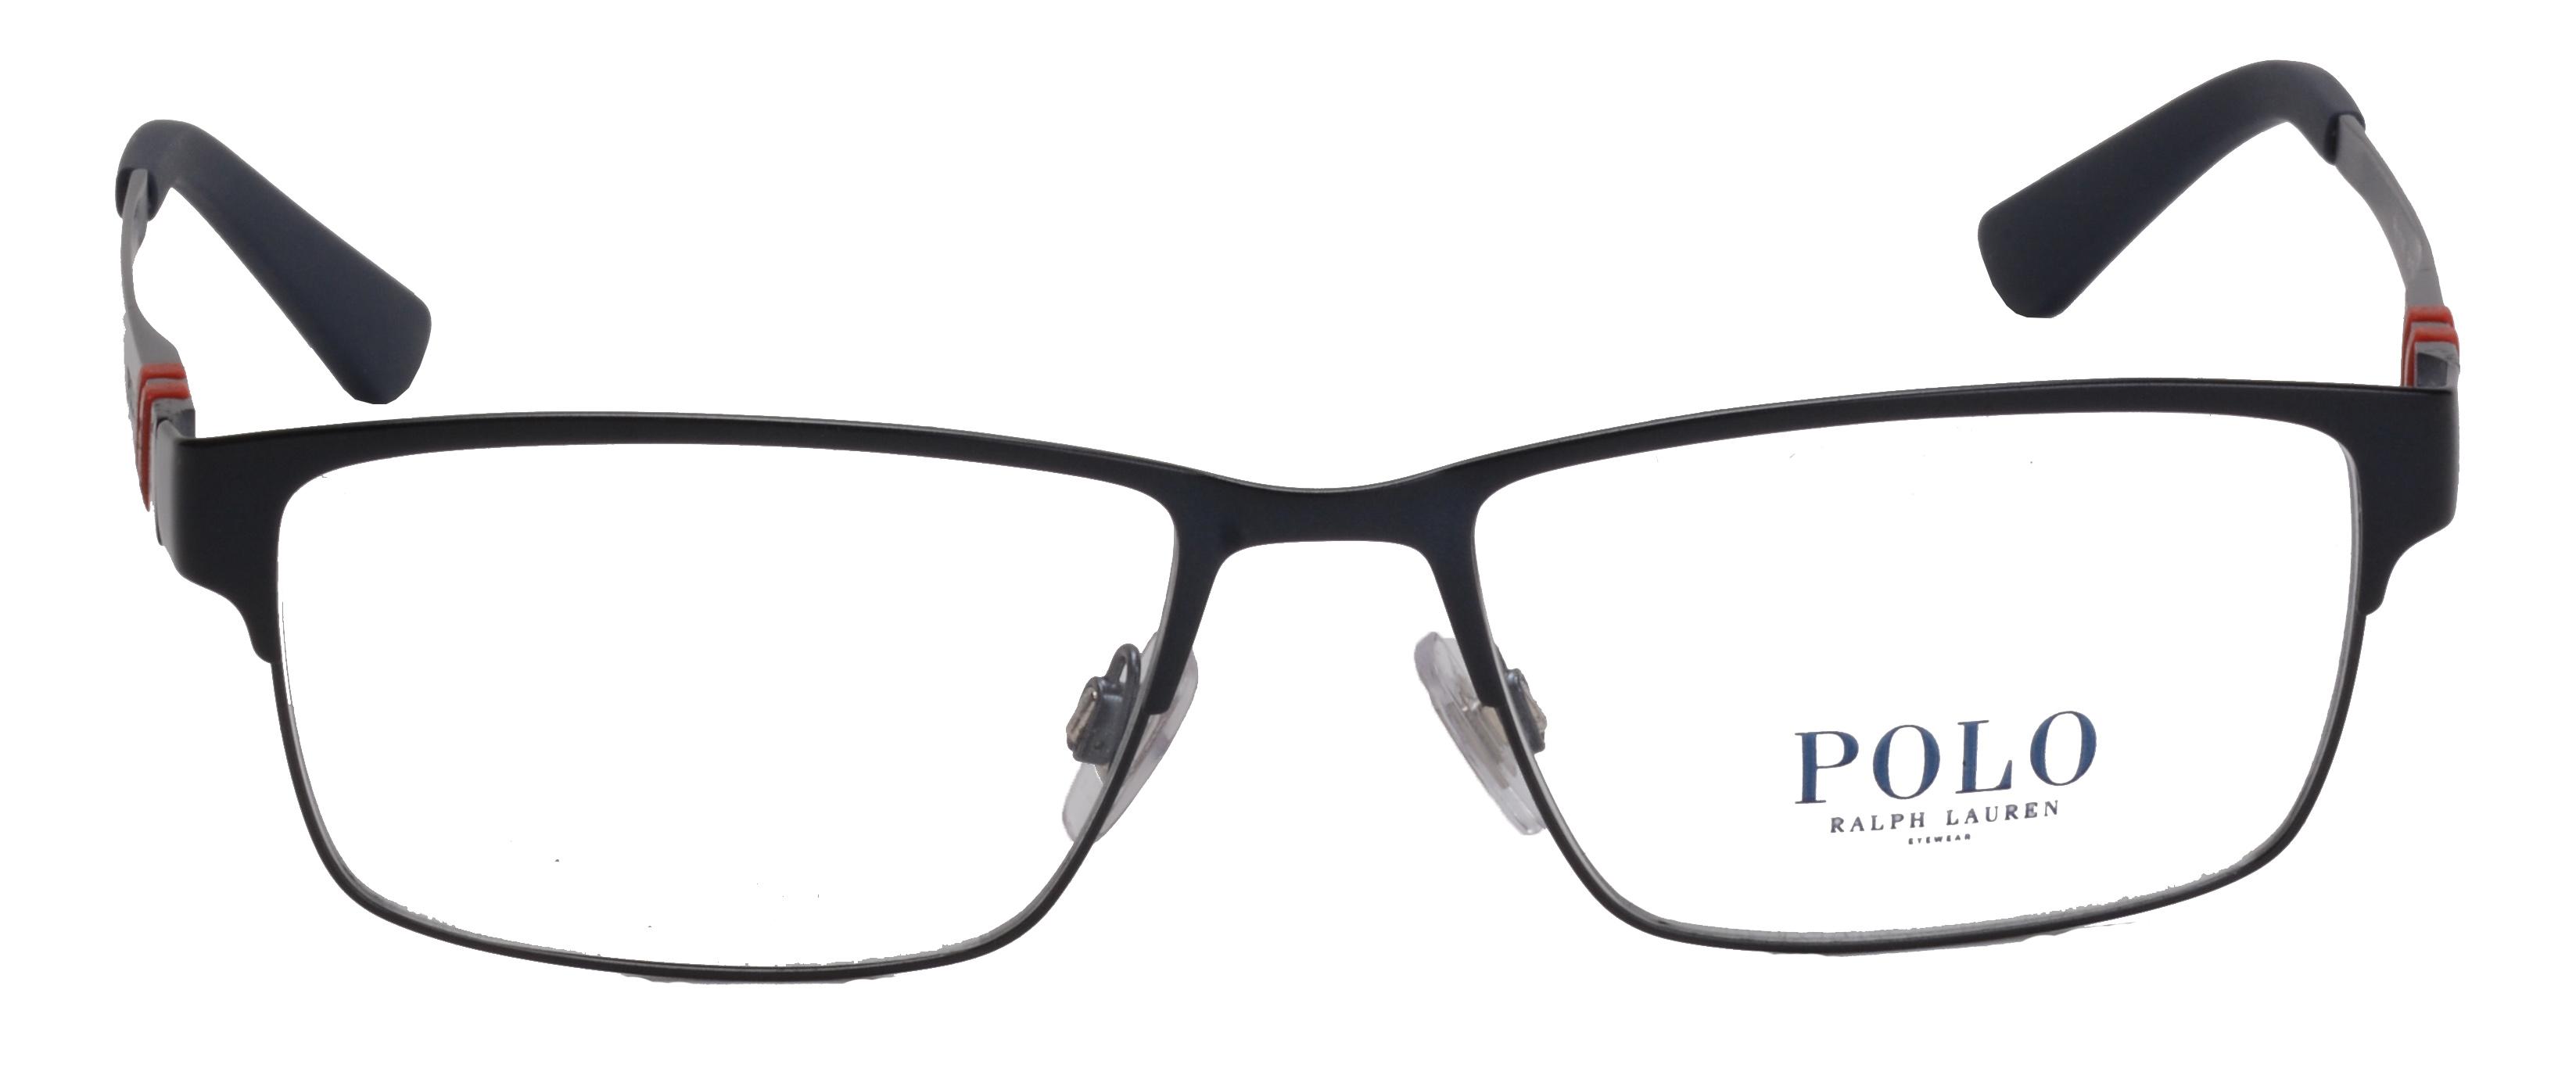 Polo By Ralph Lauren Men S Eyewear Frames Ph 54mm